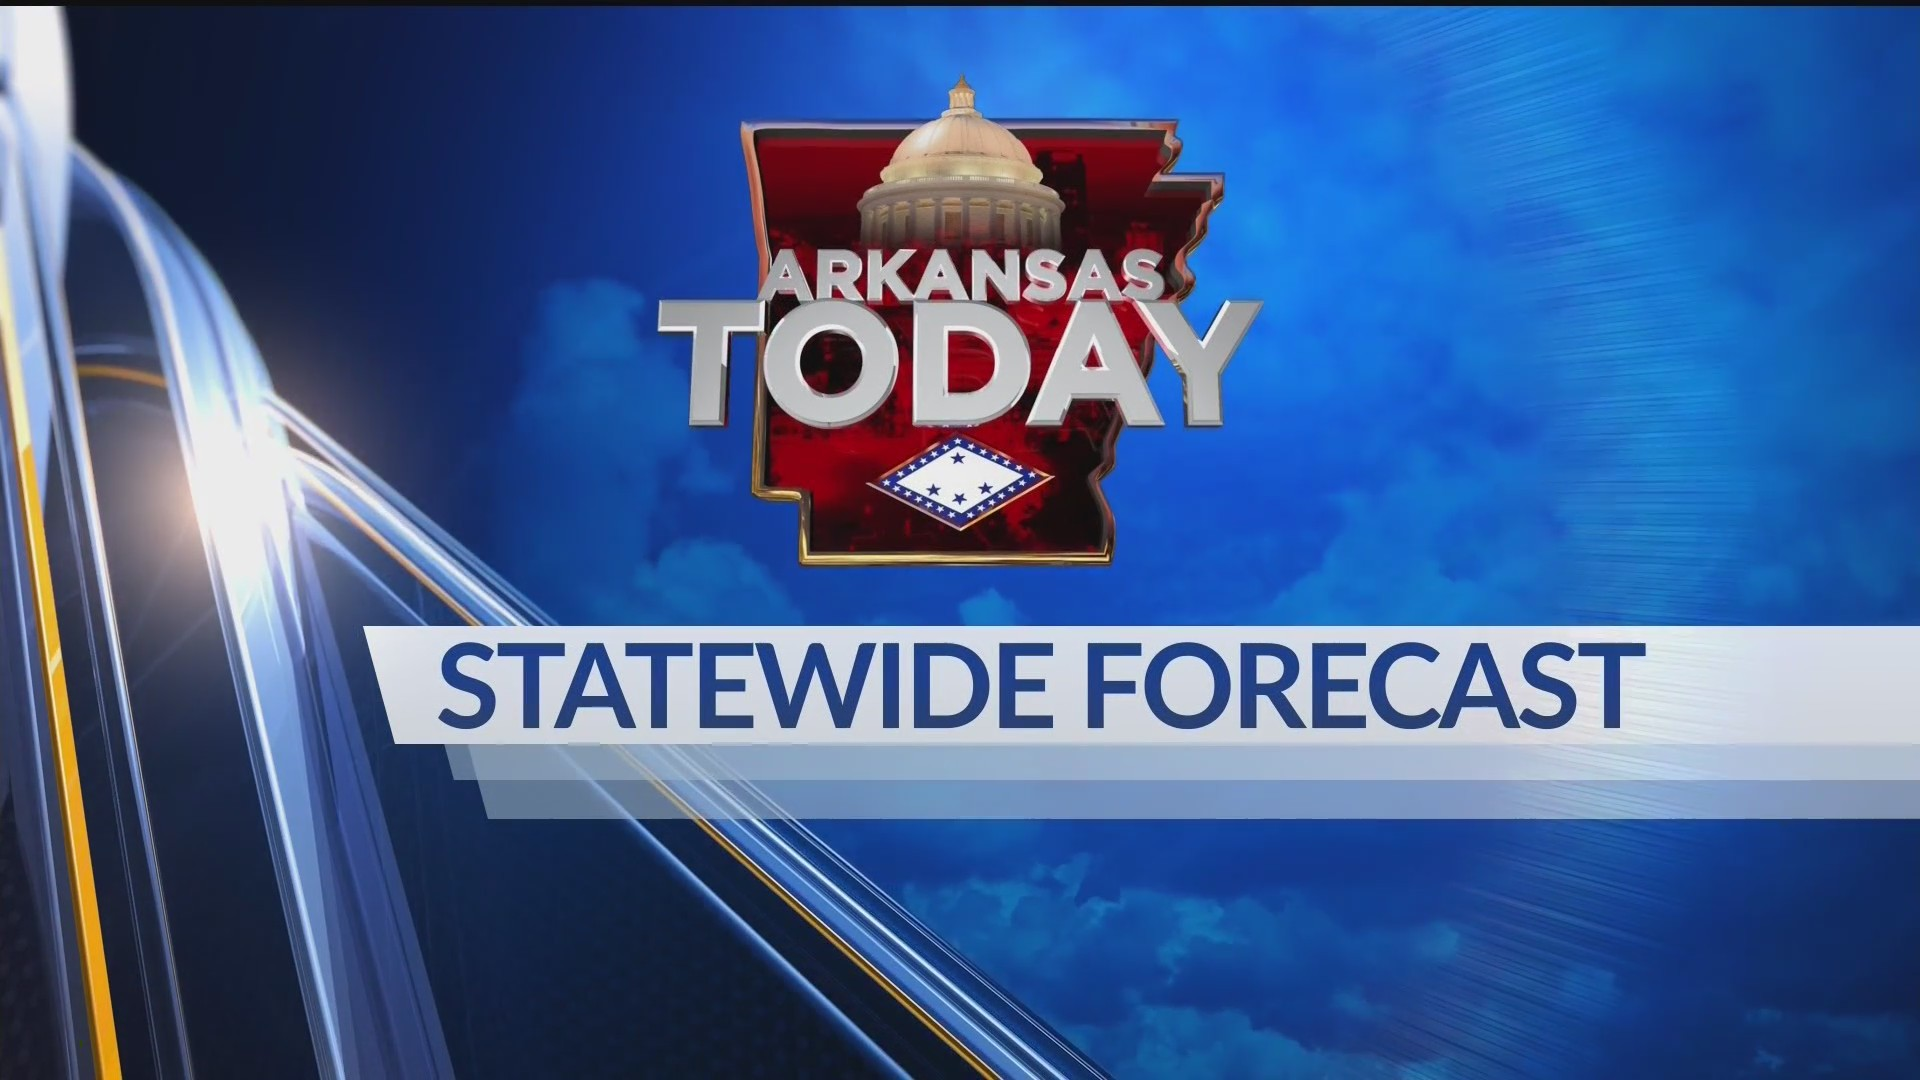 Arkansas_Statewide_Forecast_for_April_12_1_20190412190223-118809306